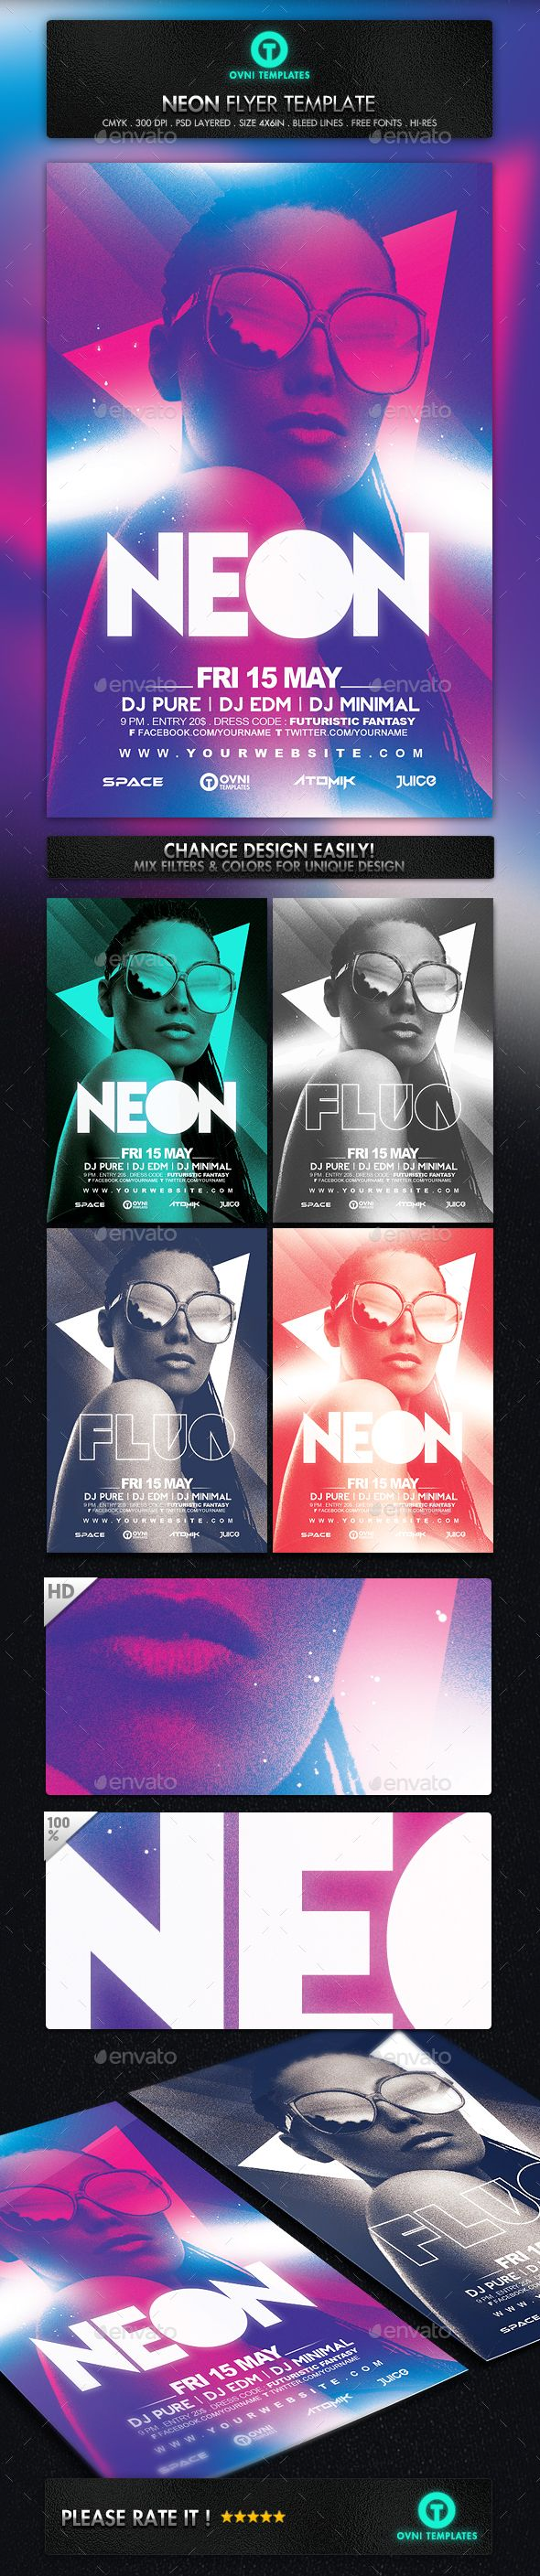 Neon Light Electro Girl Flyer Template PSD #design Download…